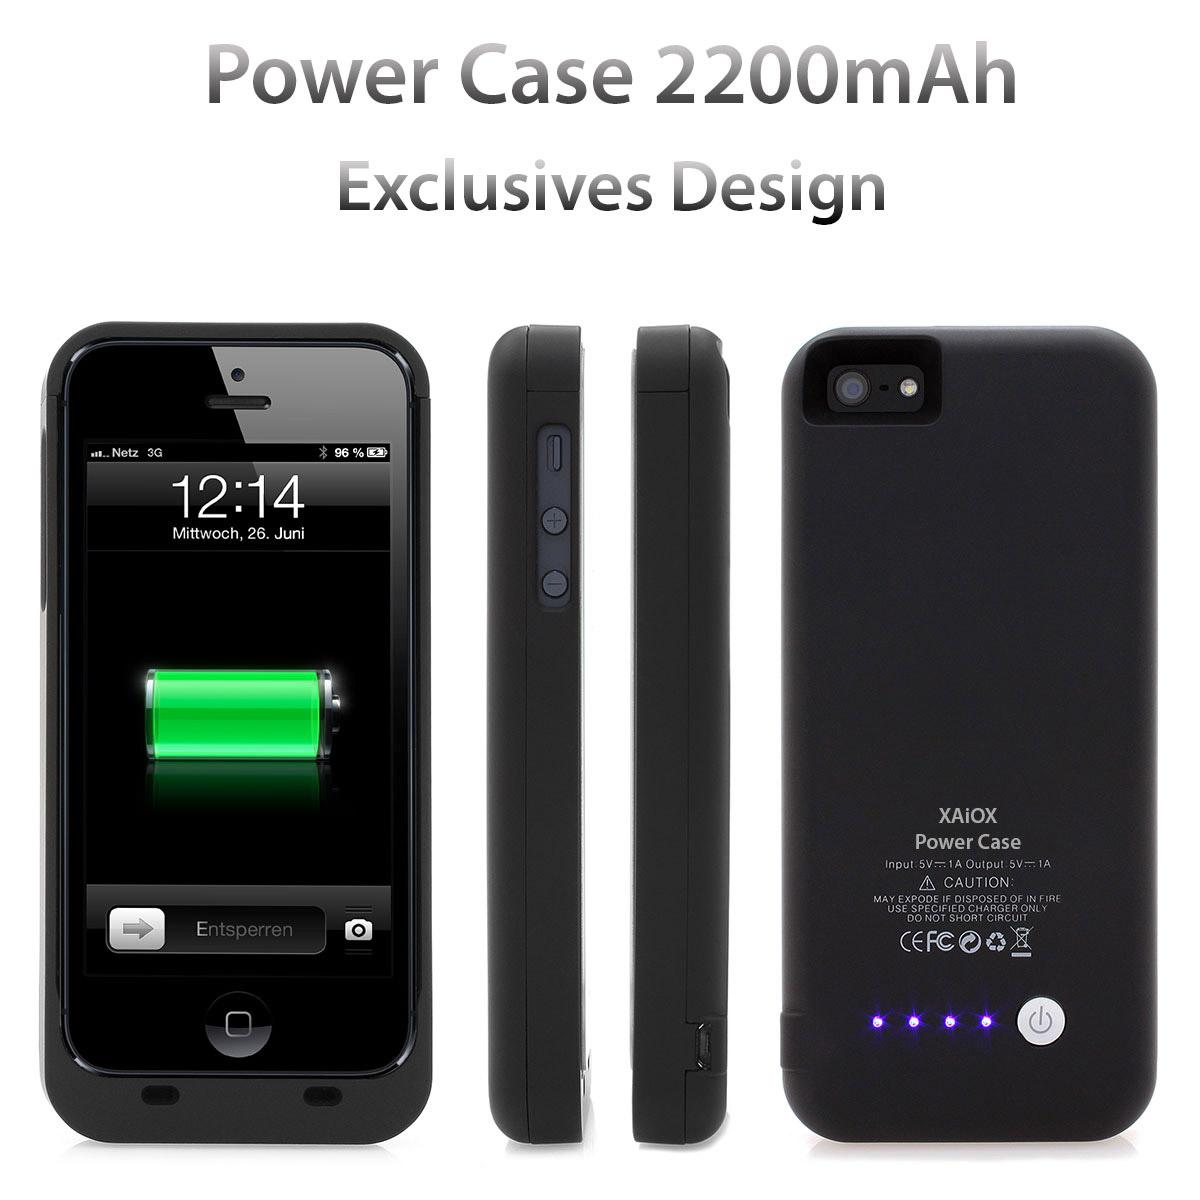 iPhone-5-Power-Case-Akku-Li-Polymer-Cover-mit-2500mAh-Zusatzakku-schwarz